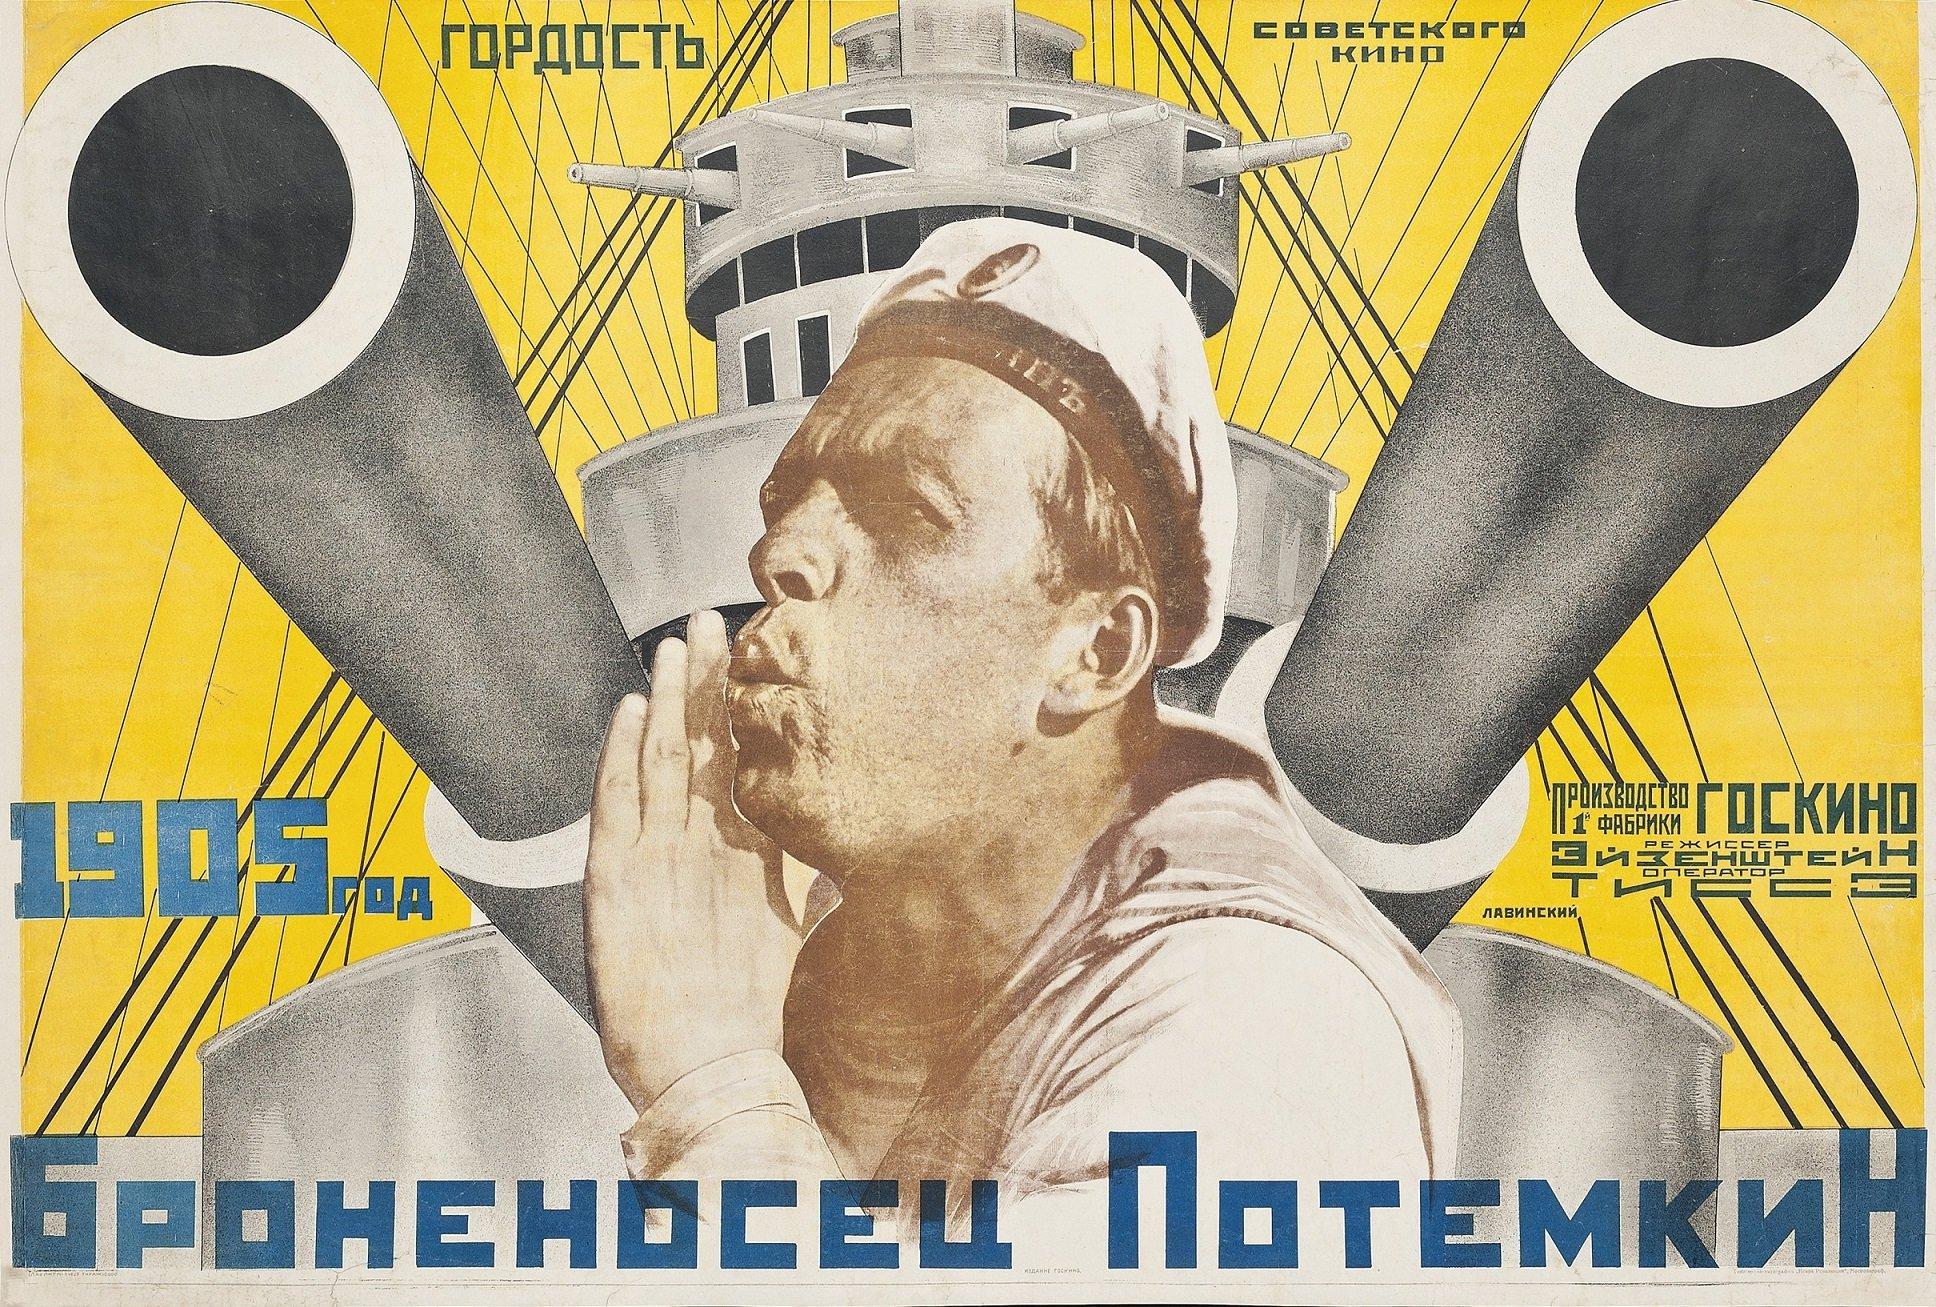 battleship potemkin as propaganda The russian master's 1925 bombshell battleship potemkin a/k/a cinema history's third greatest game-changer for all potemkin's rabble-rousing propaganda.